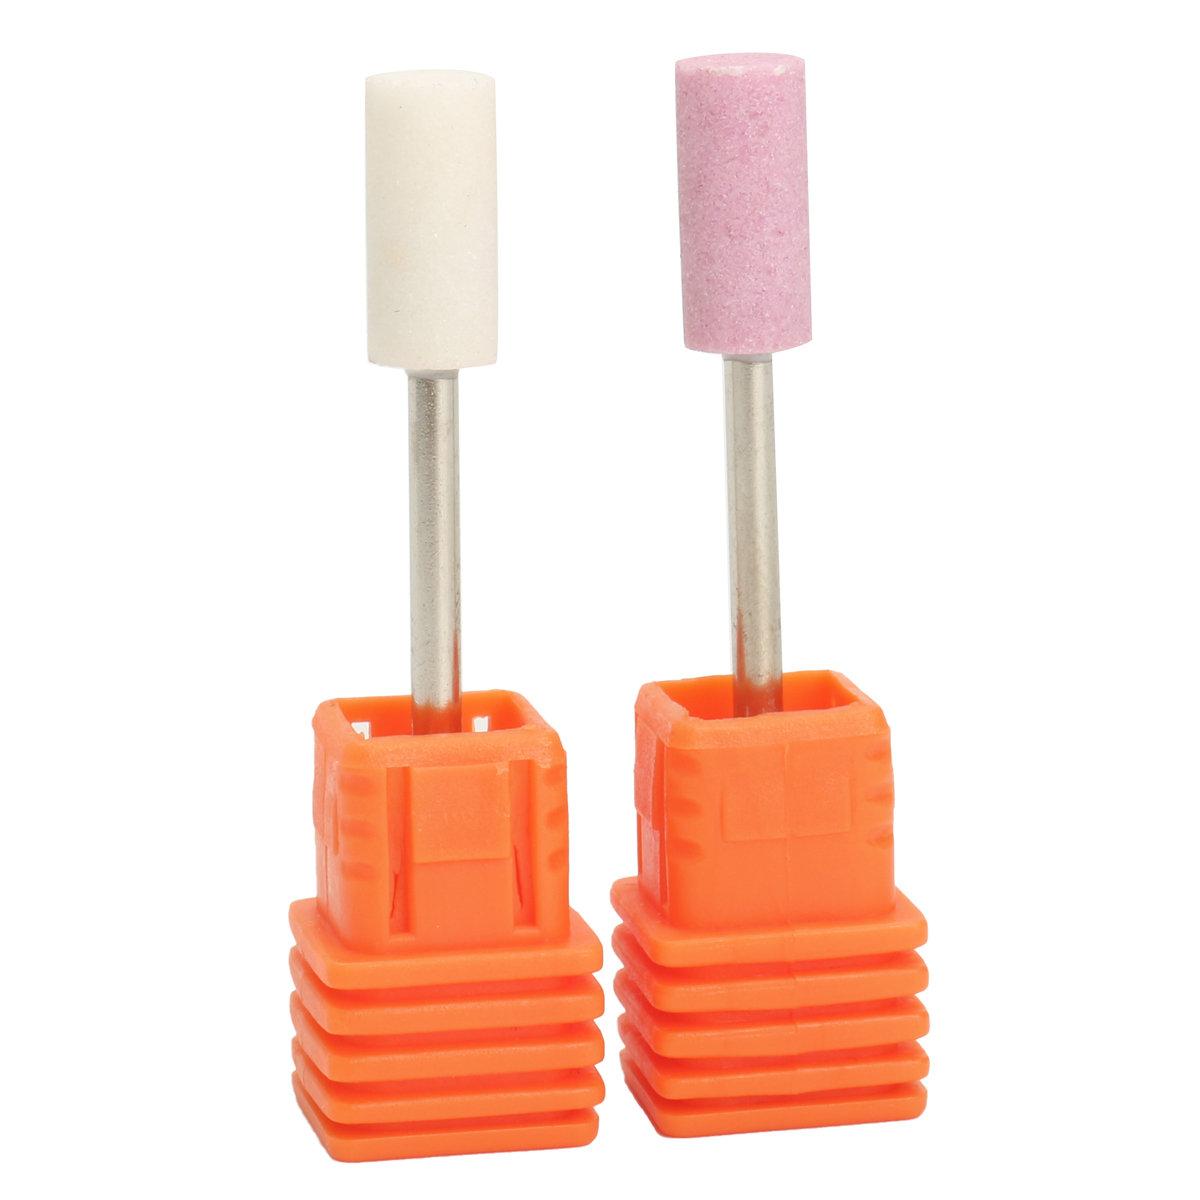 3/32 Inch Shank Pro Ceramic Carbide Nail Drill Bit Rotary File Manicure Pedicure Tool